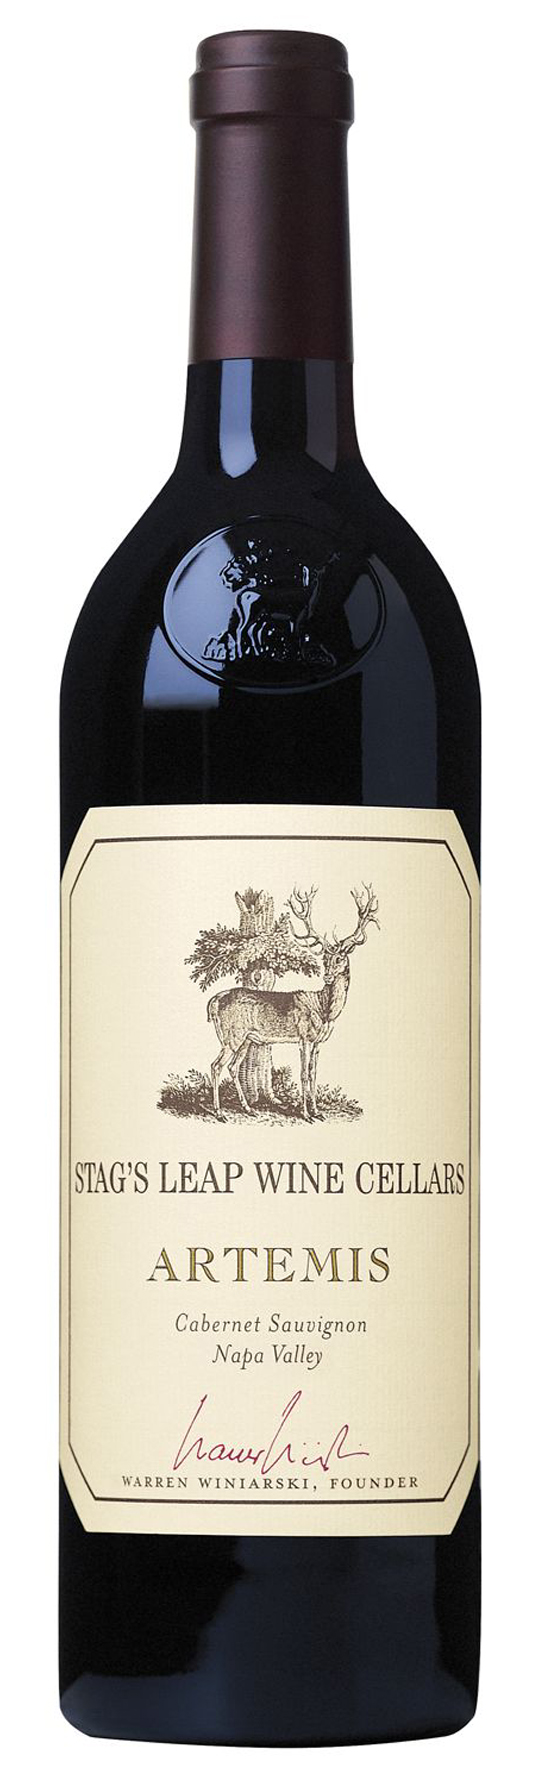 Artemis Cabernet Sauvignon Stag´s Leap Wine Cellars 2013